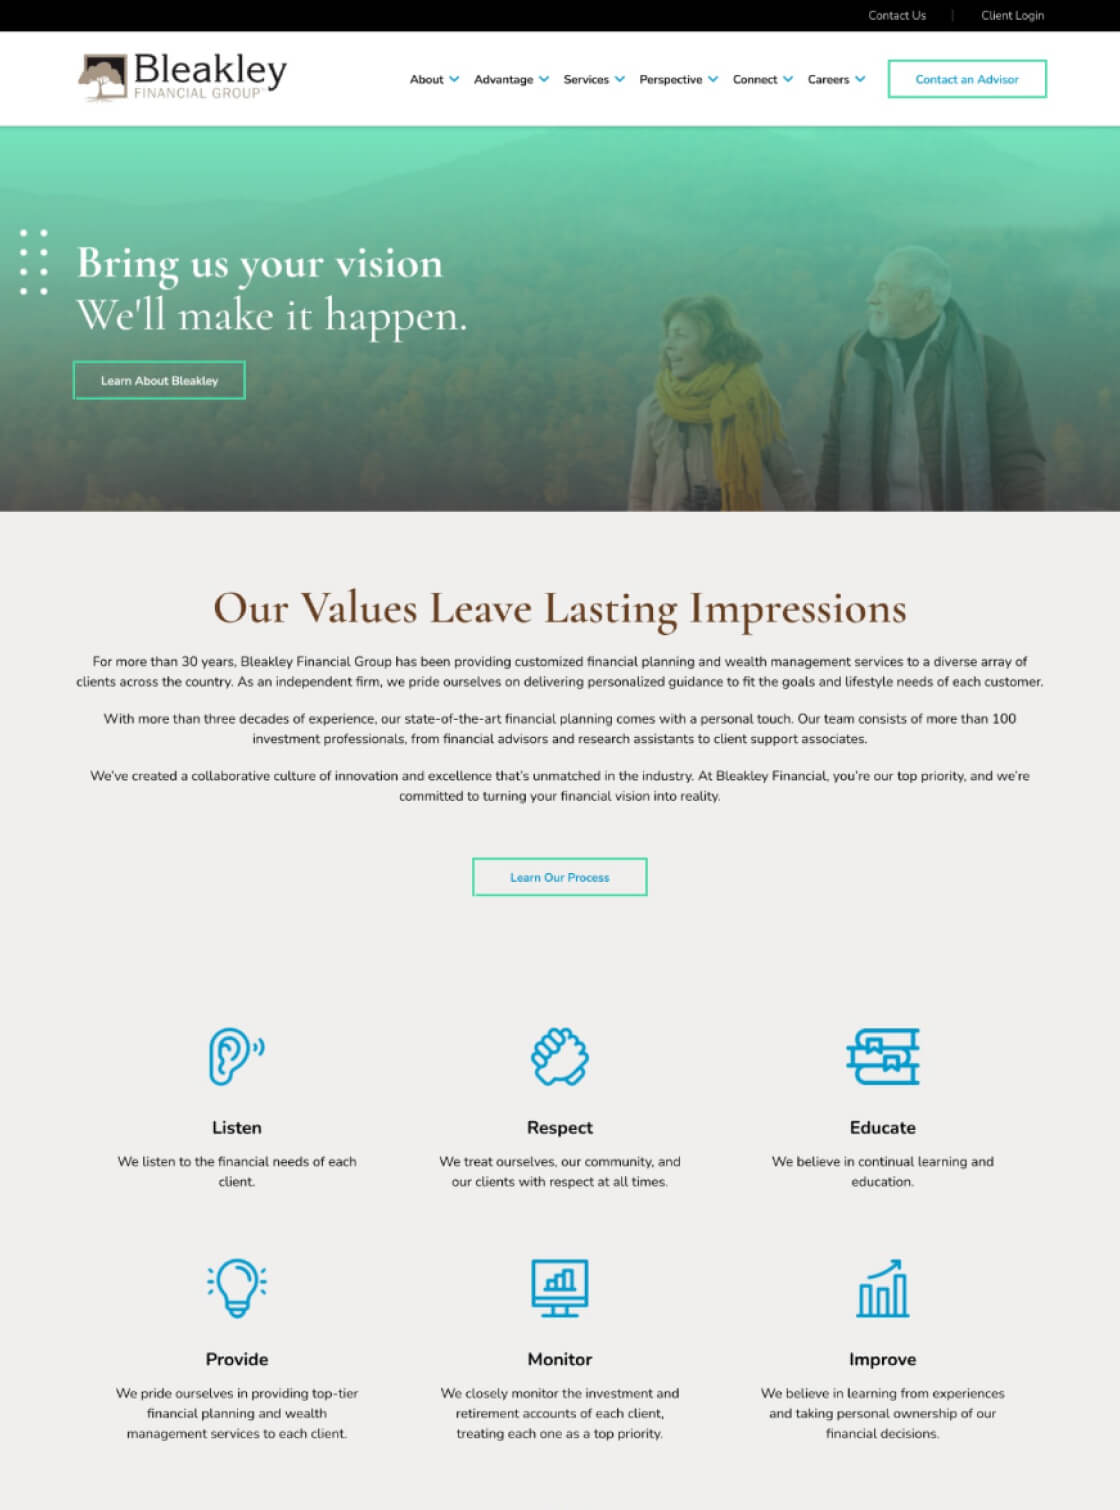 Bleakley Financial Website Desktop View